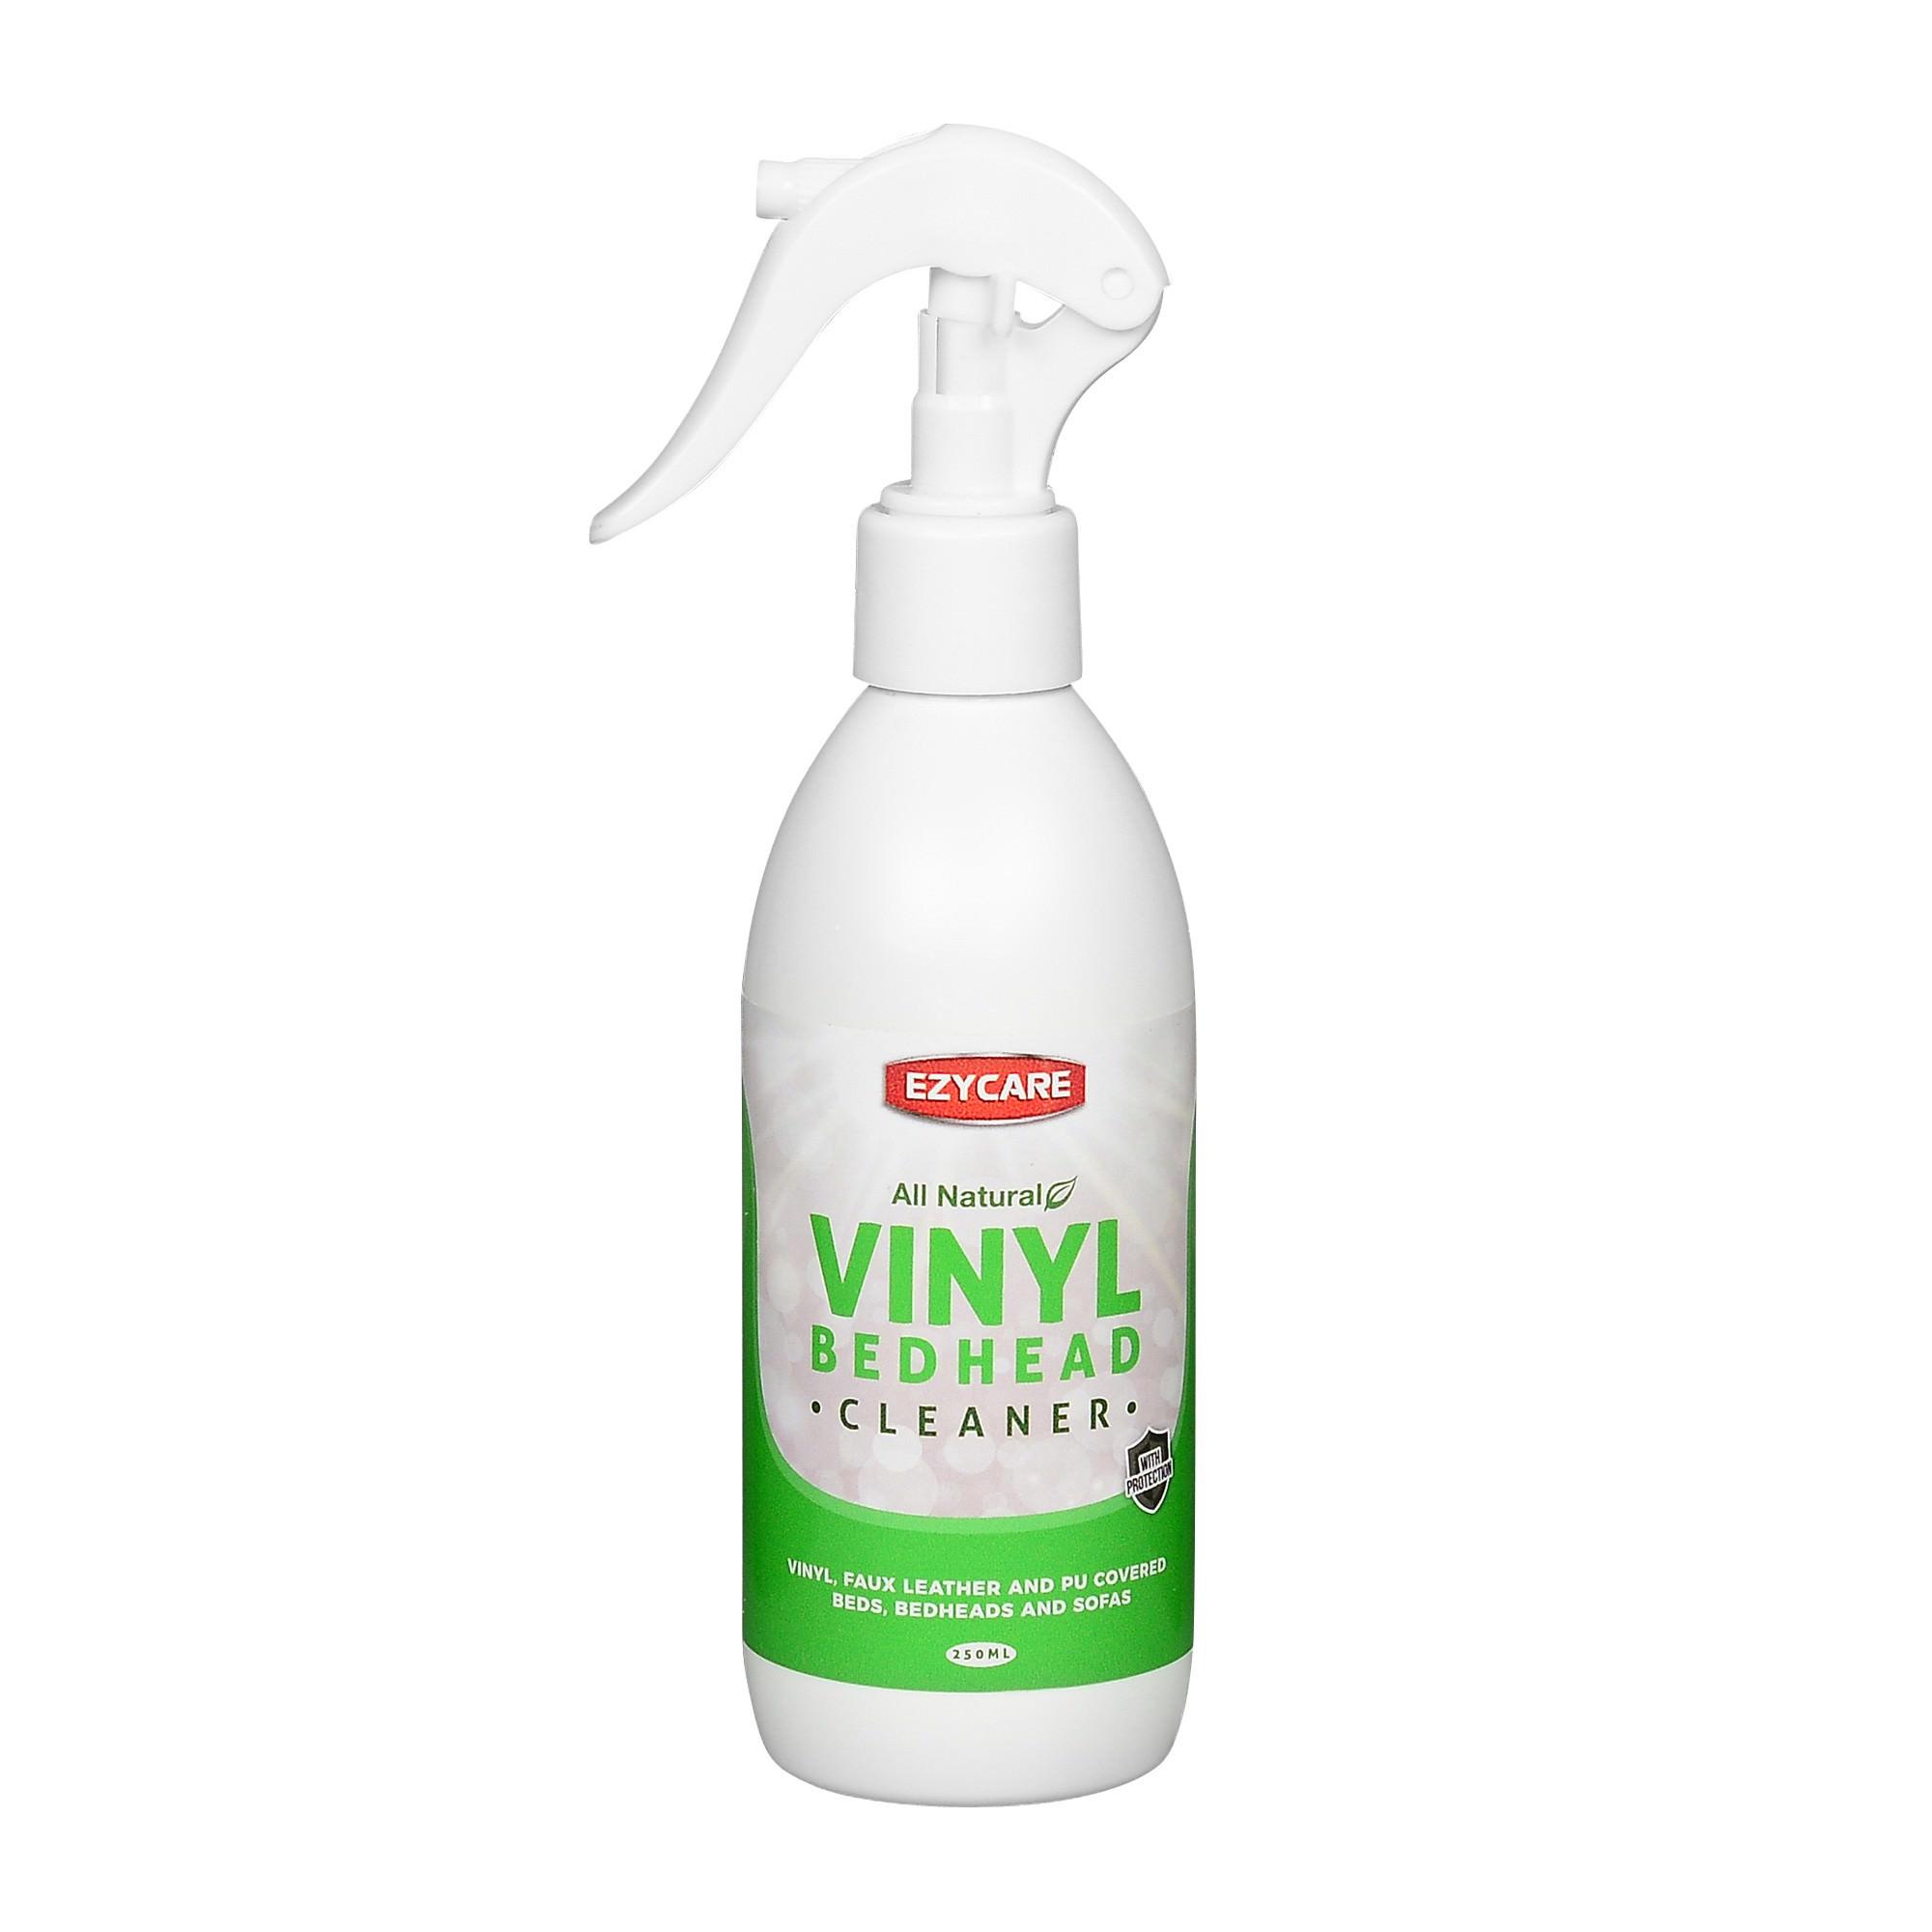 Ezycare Vinyl Bedhead Cleaner, 250ml